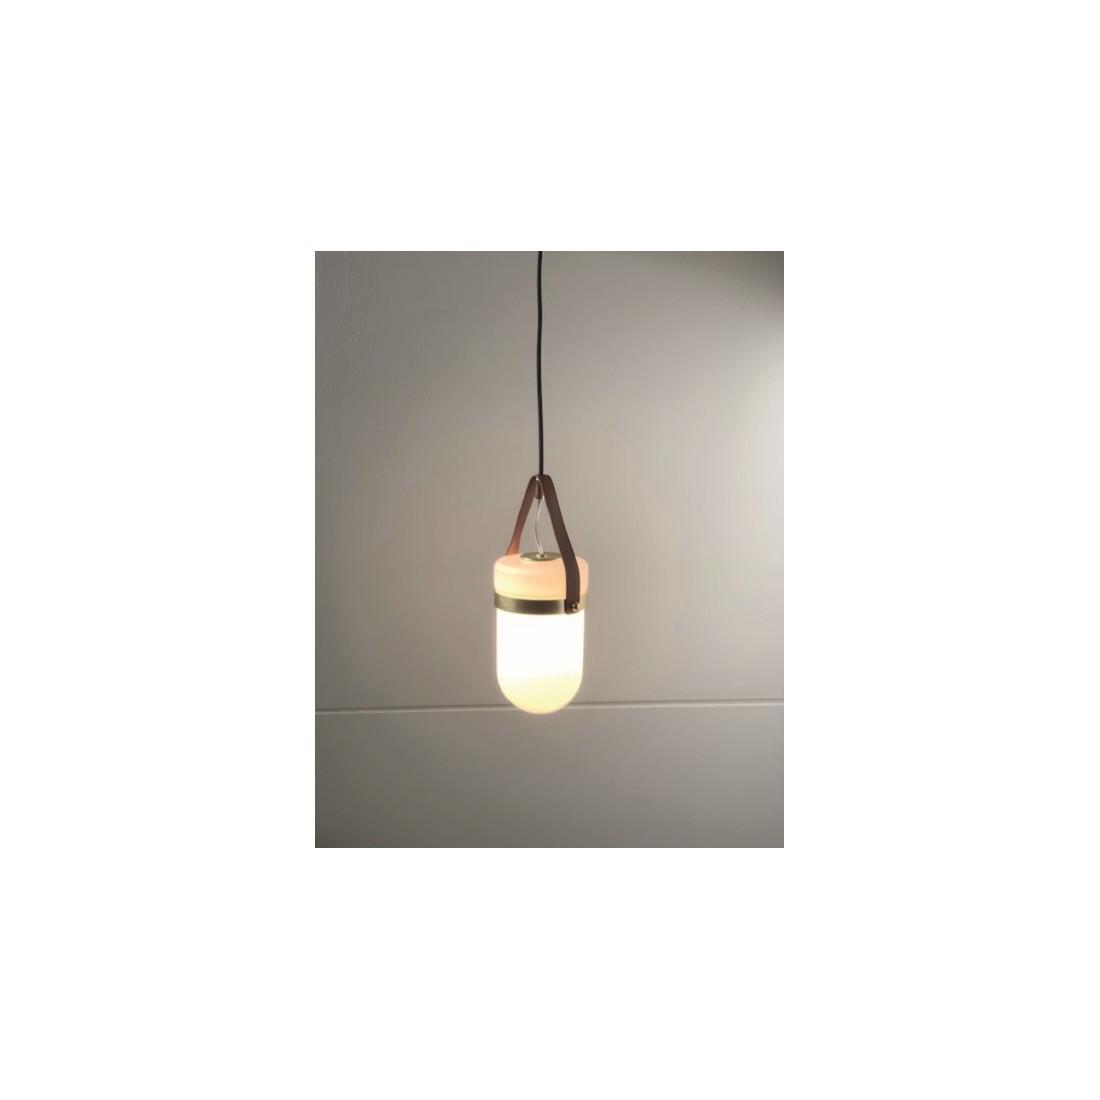 L mpara colgante modelo espejo de dise o 6 iluminaci n for Modelos de lamparas